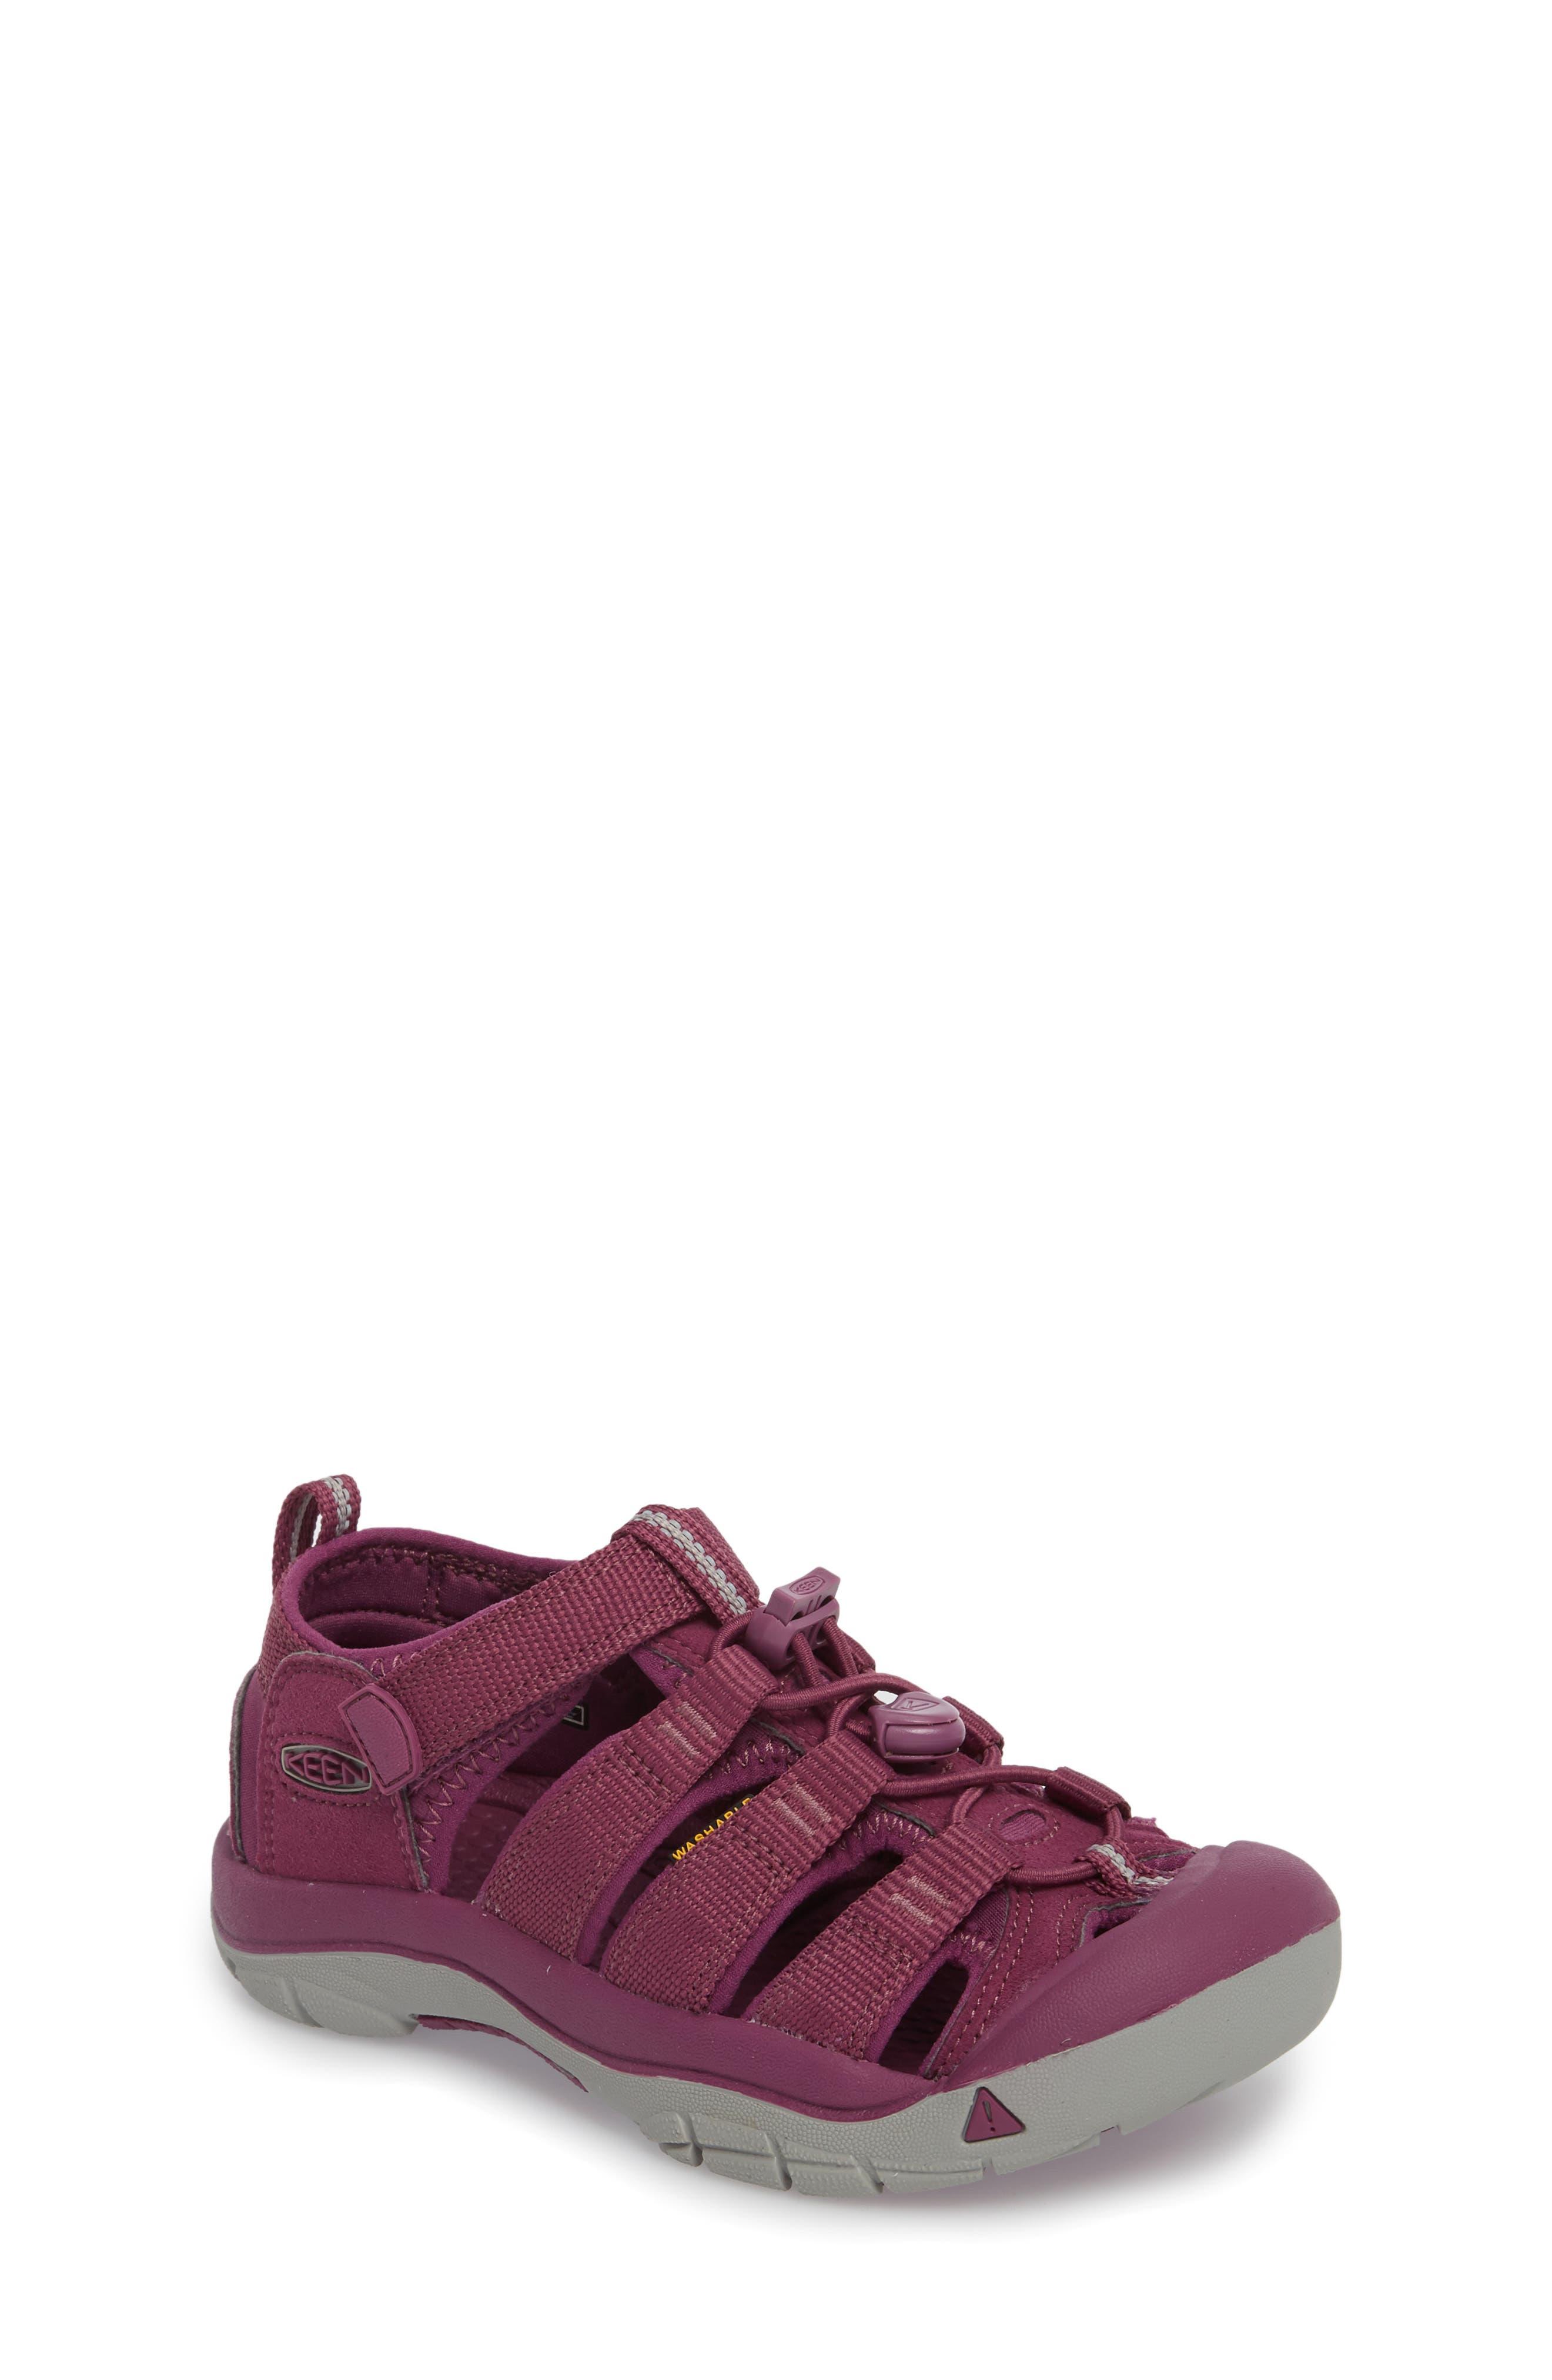 'Newport H2' Water Friendly Sandal,                         Main,                         color, Grape Kiss